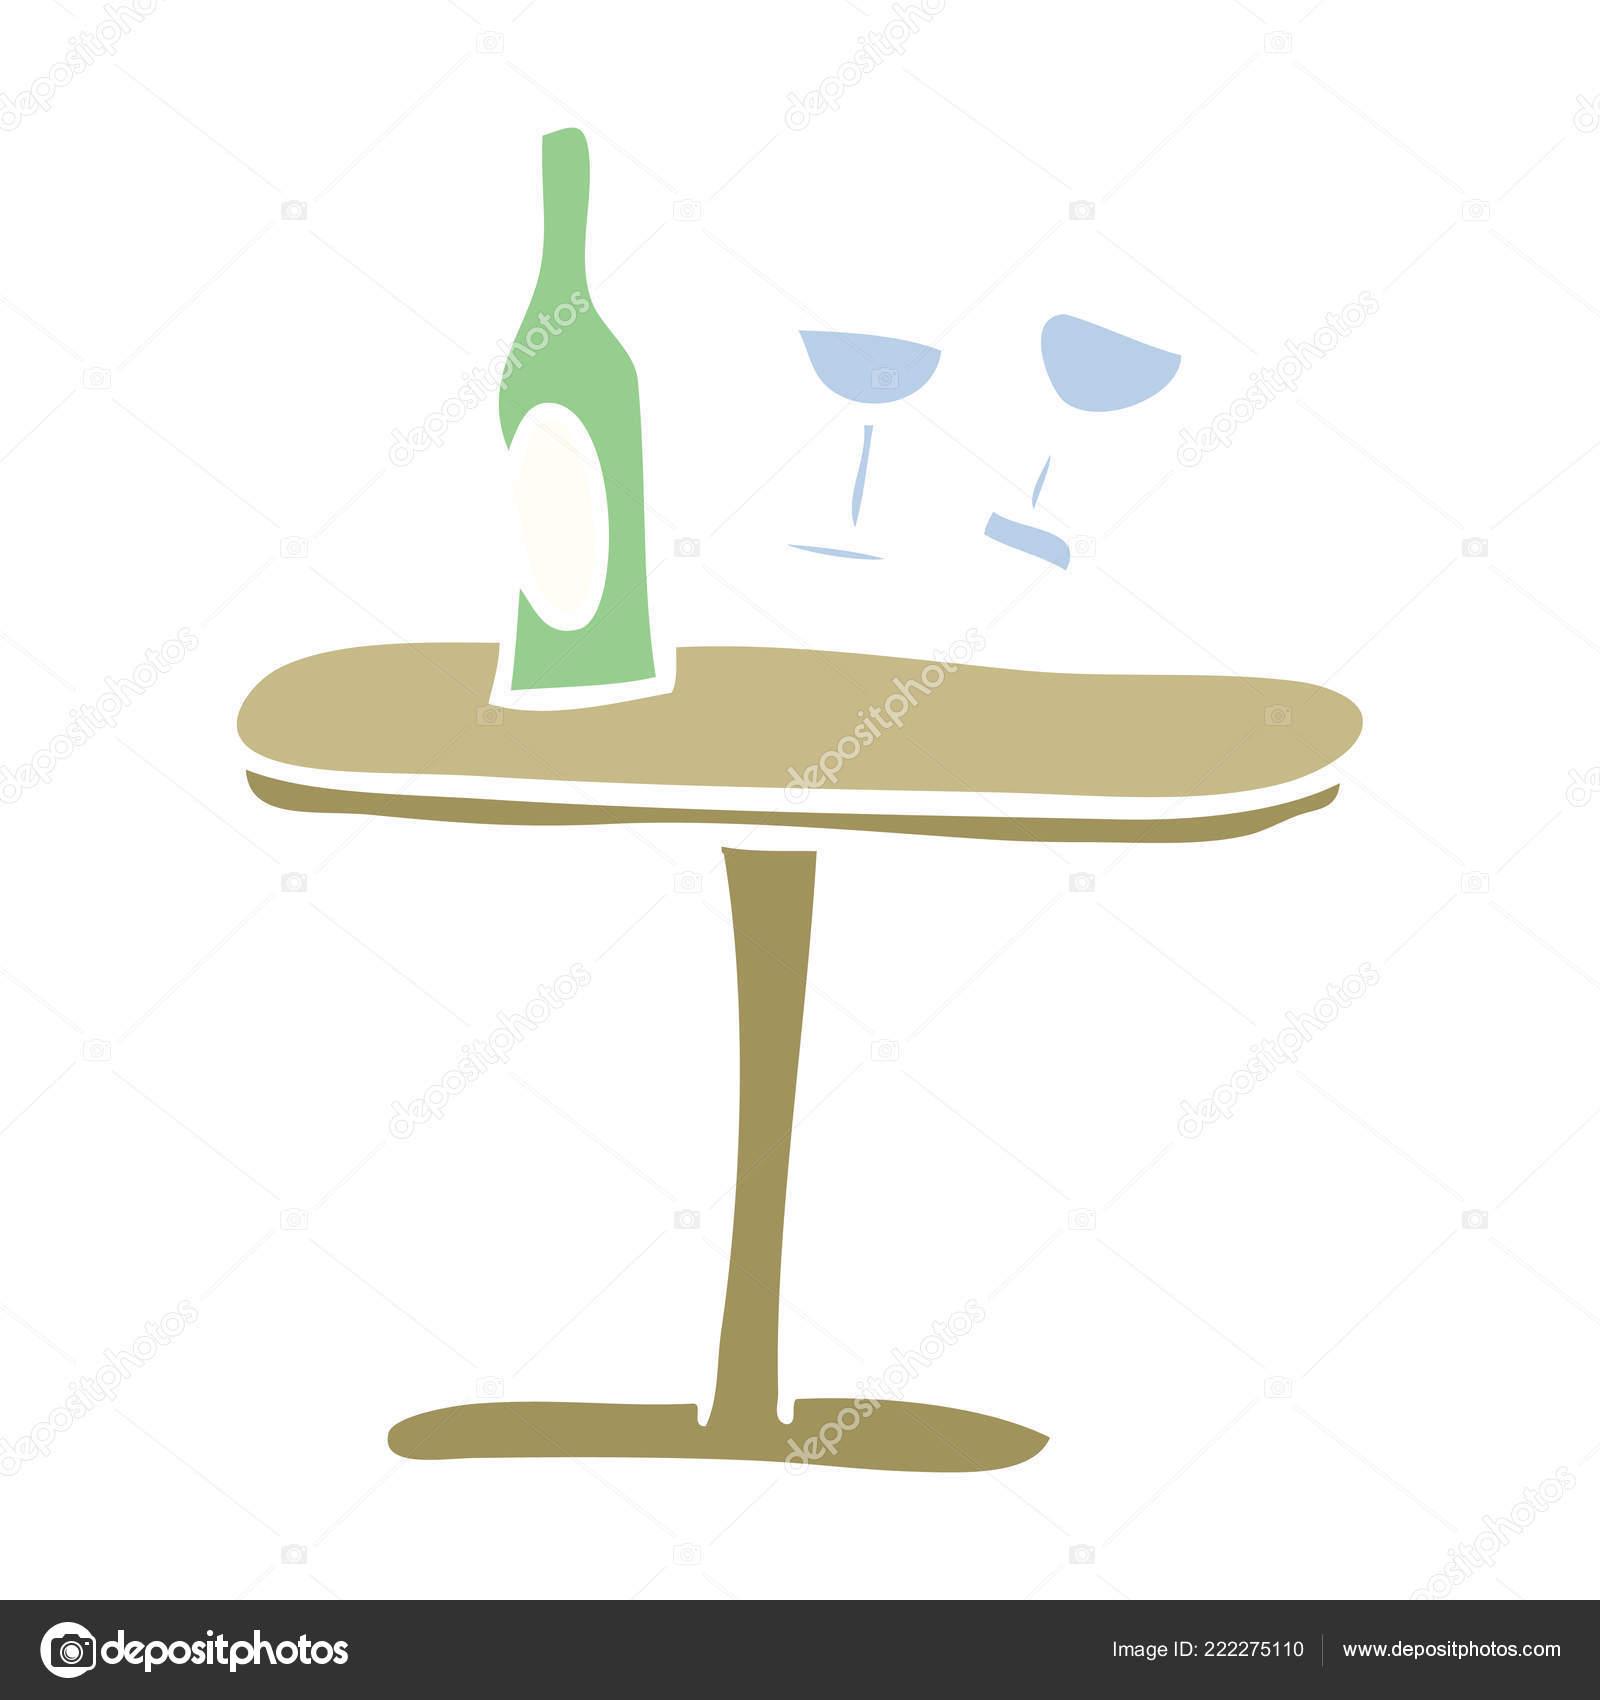 https fr depositphotos com 222275110 stock illustration flat color illustration cartoon table html